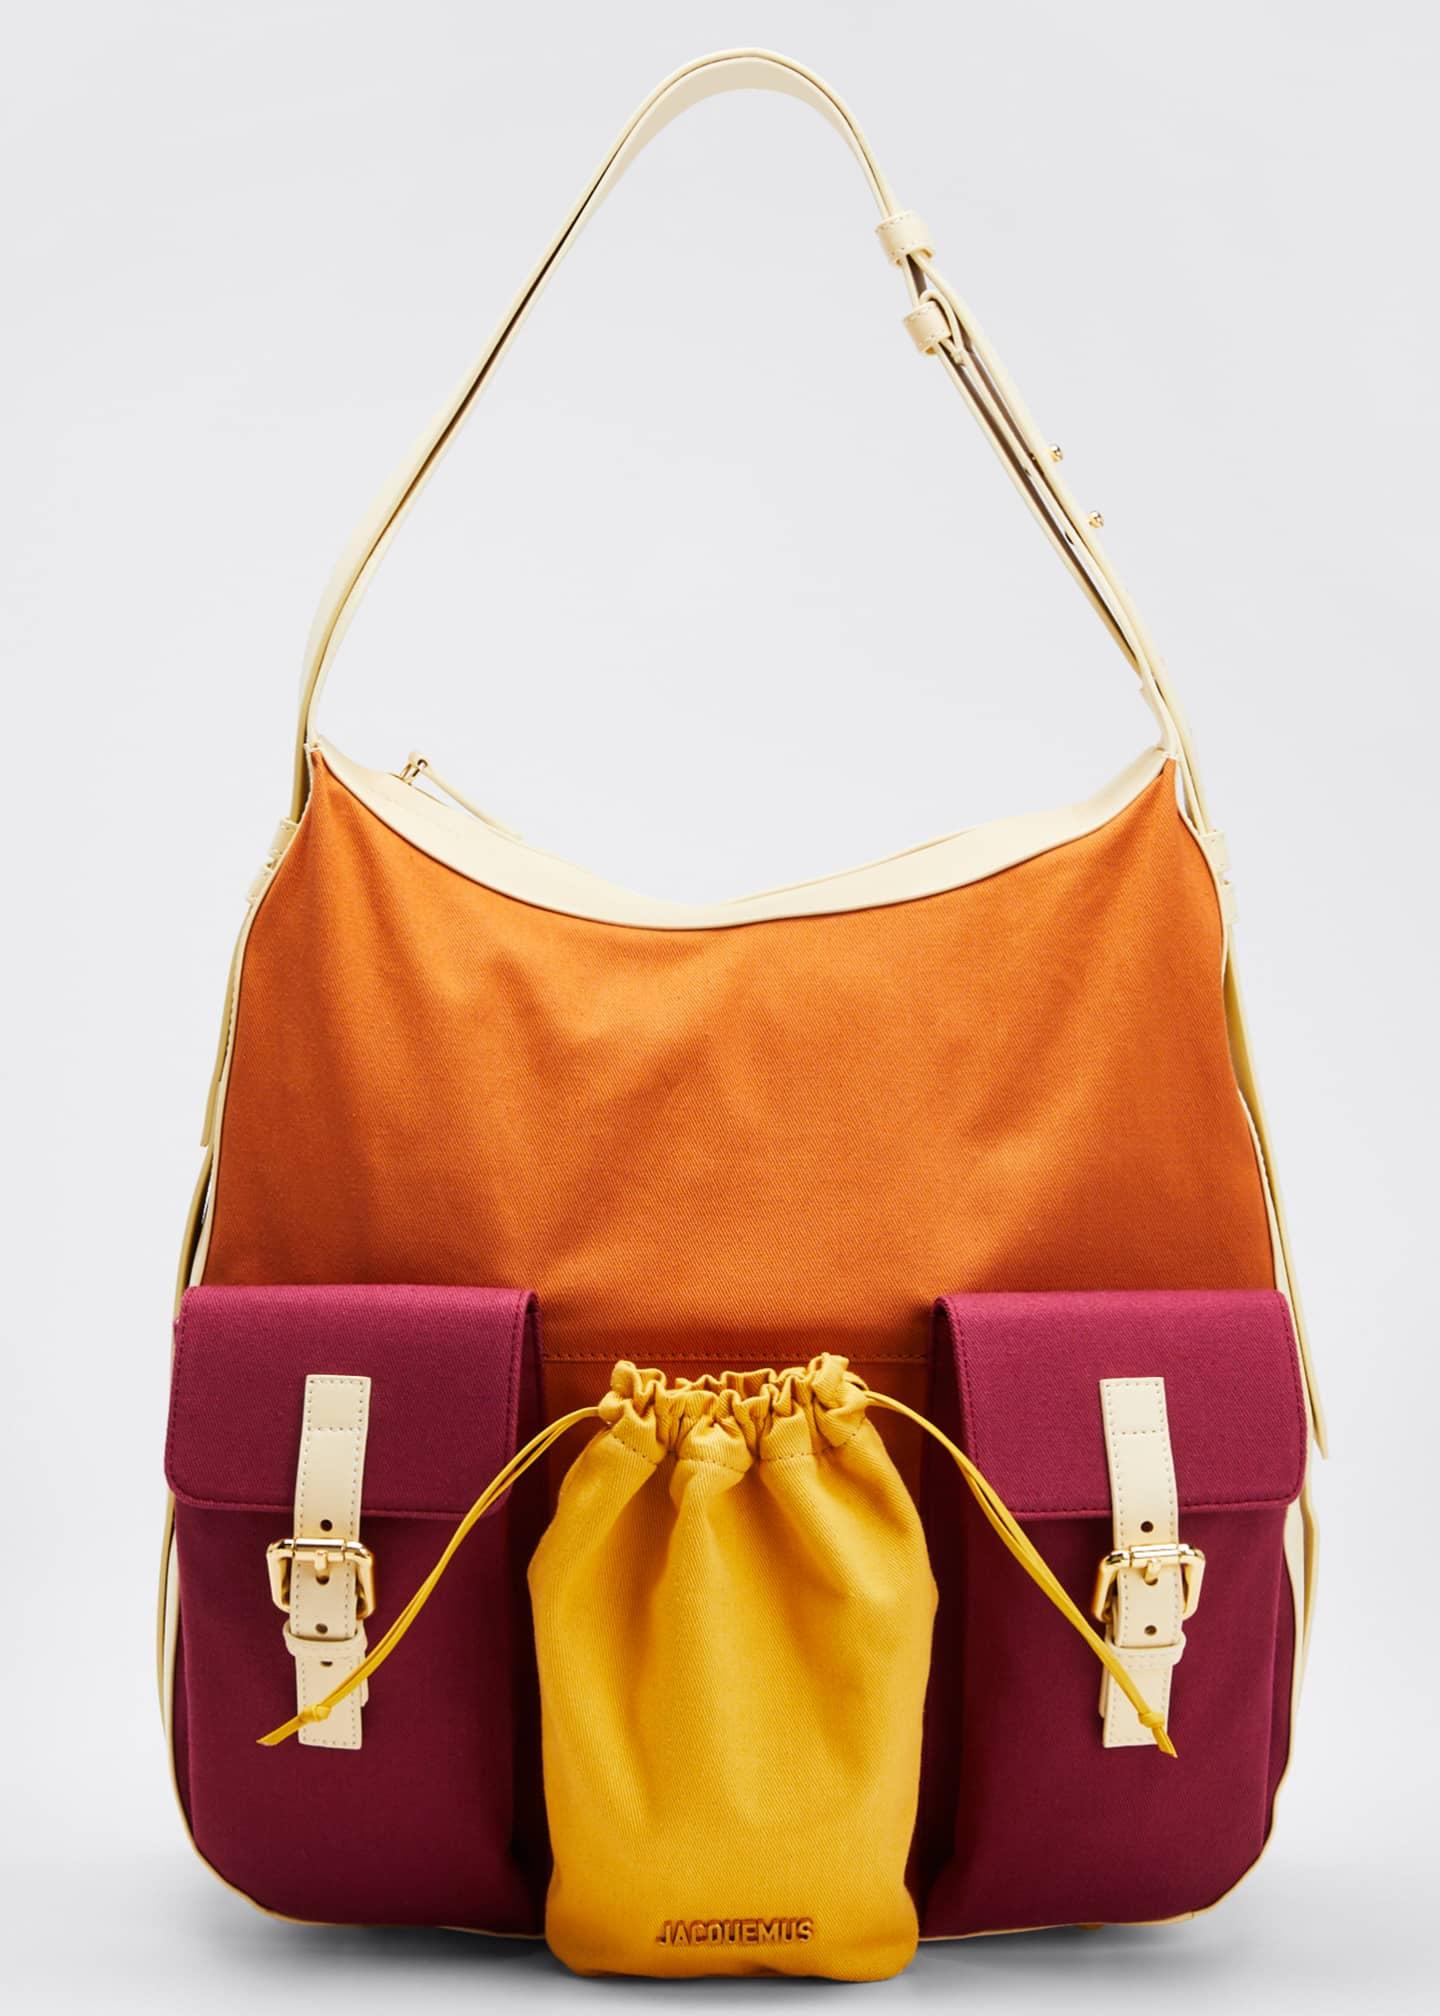 Jacquemus Cotton Le Iba Colorblock Hobo Bag